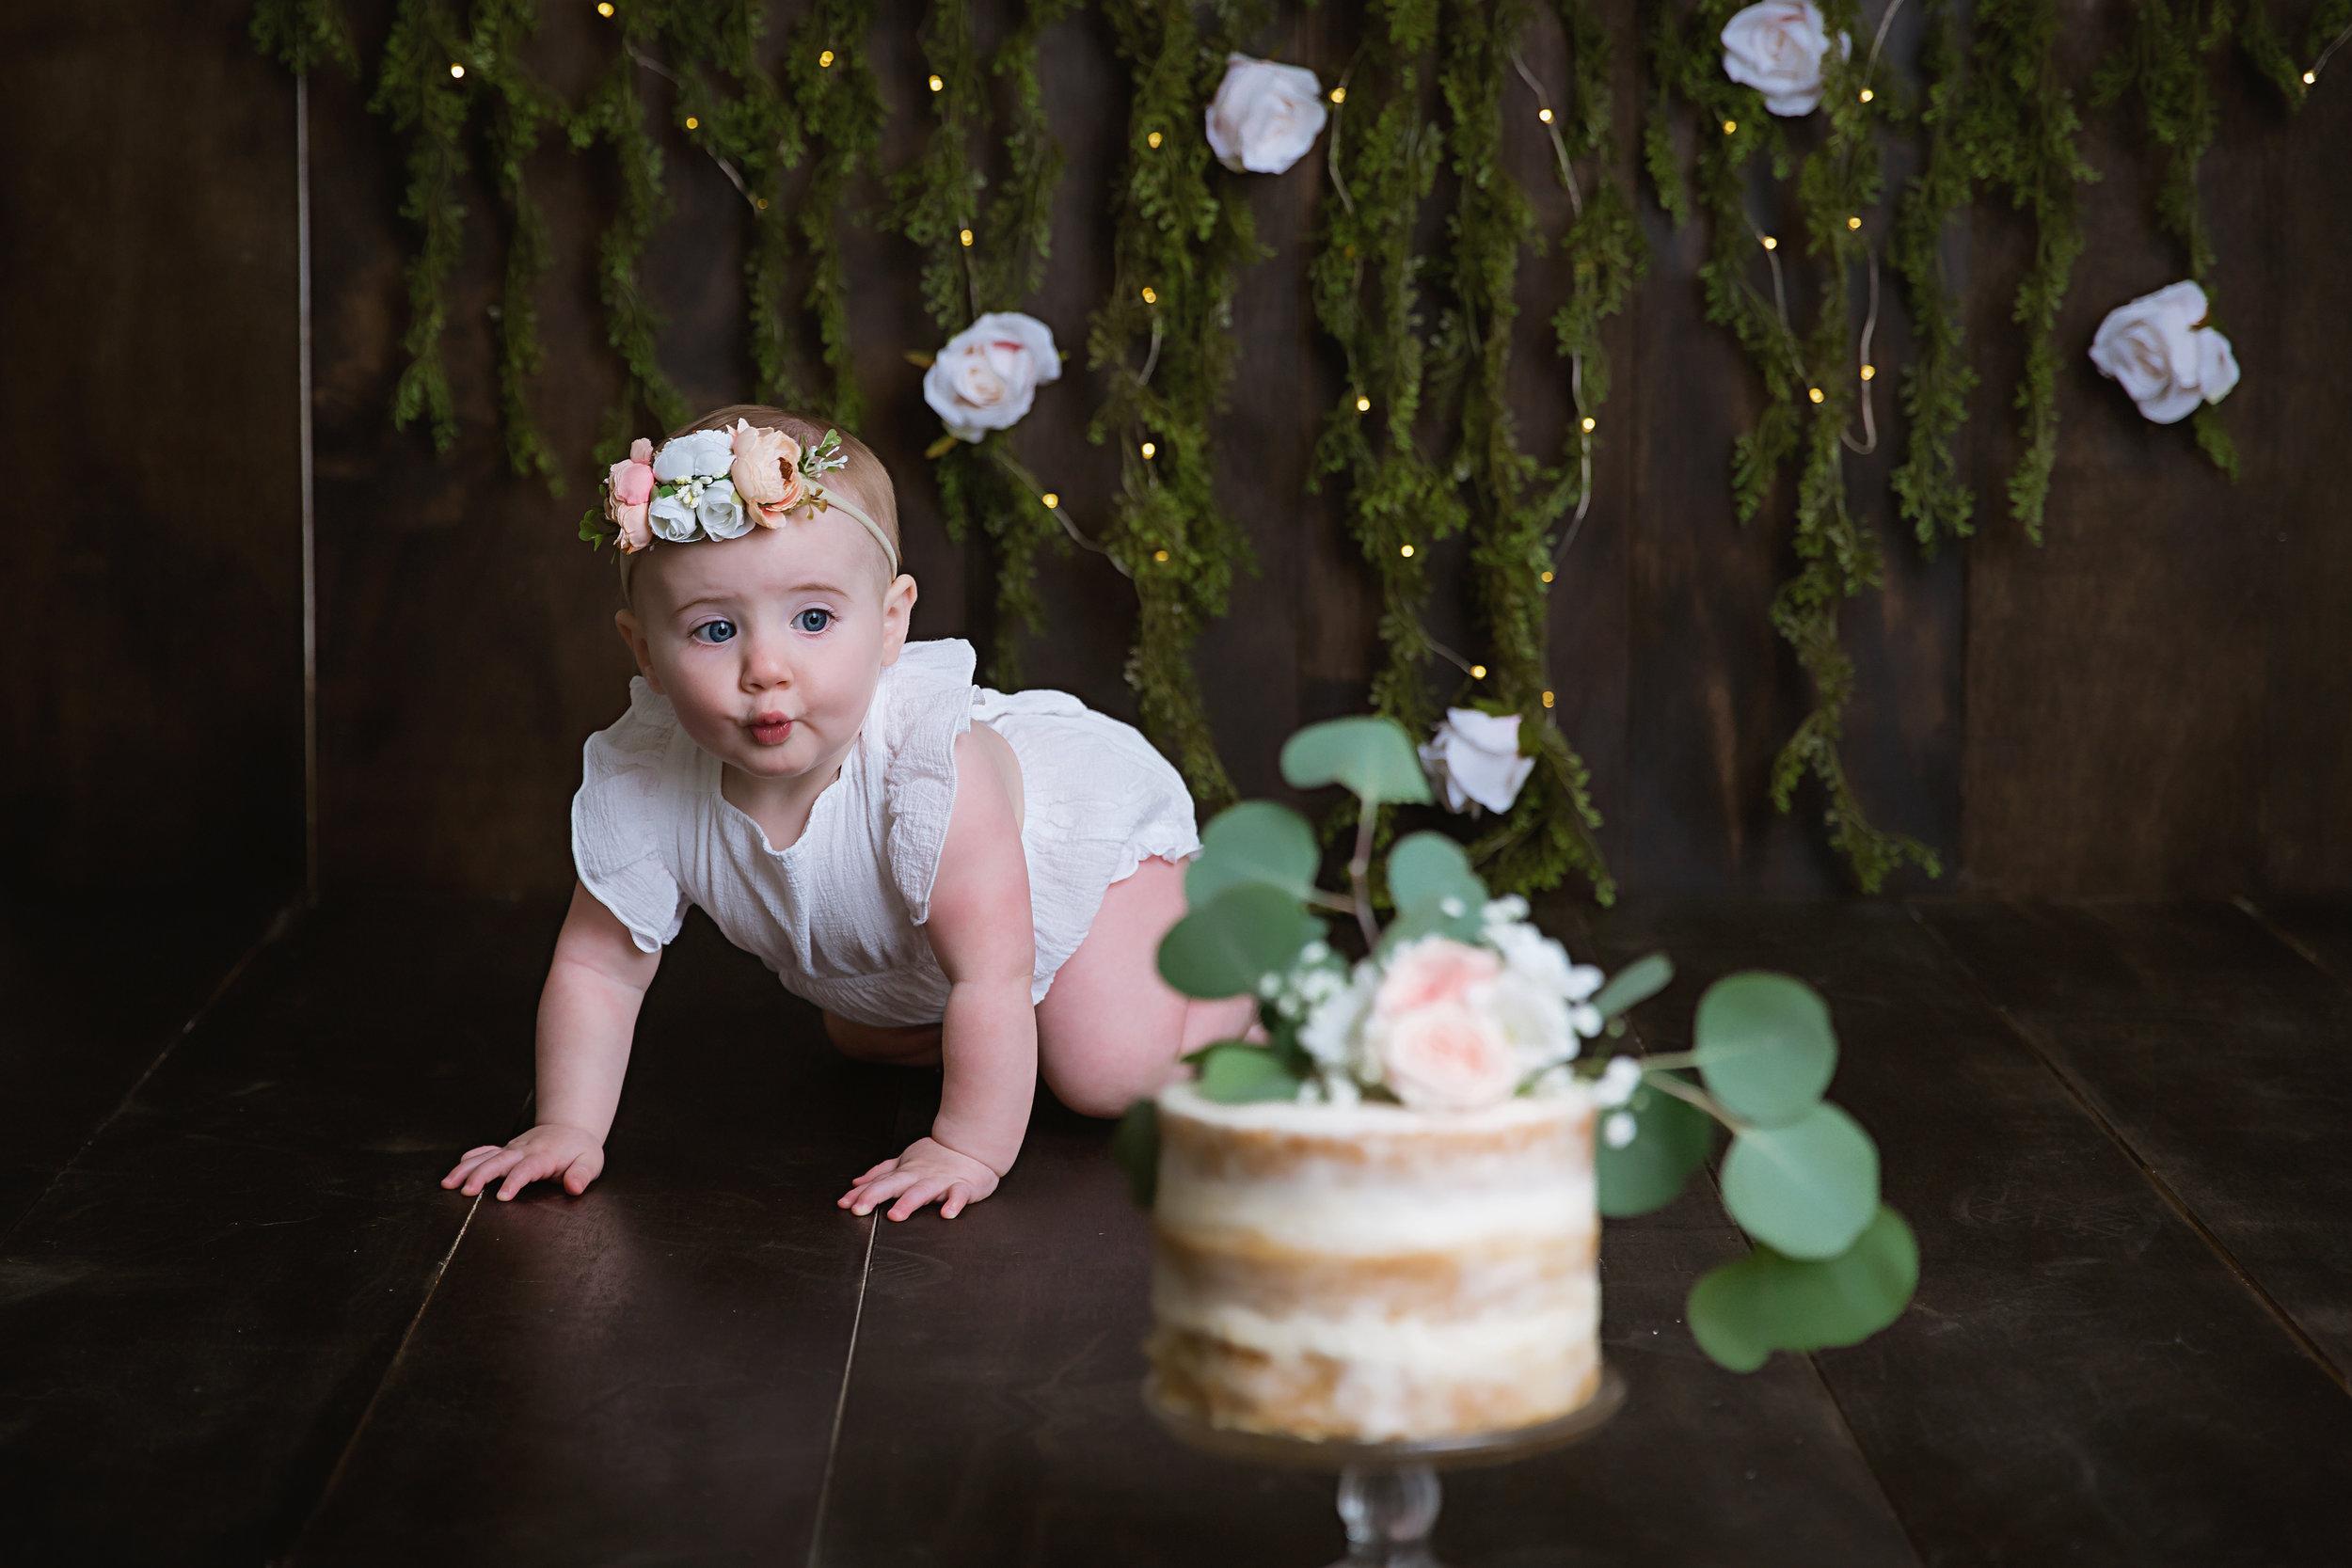 first-birthday-cake-smash-studio-flowers-greenery-south-jersey